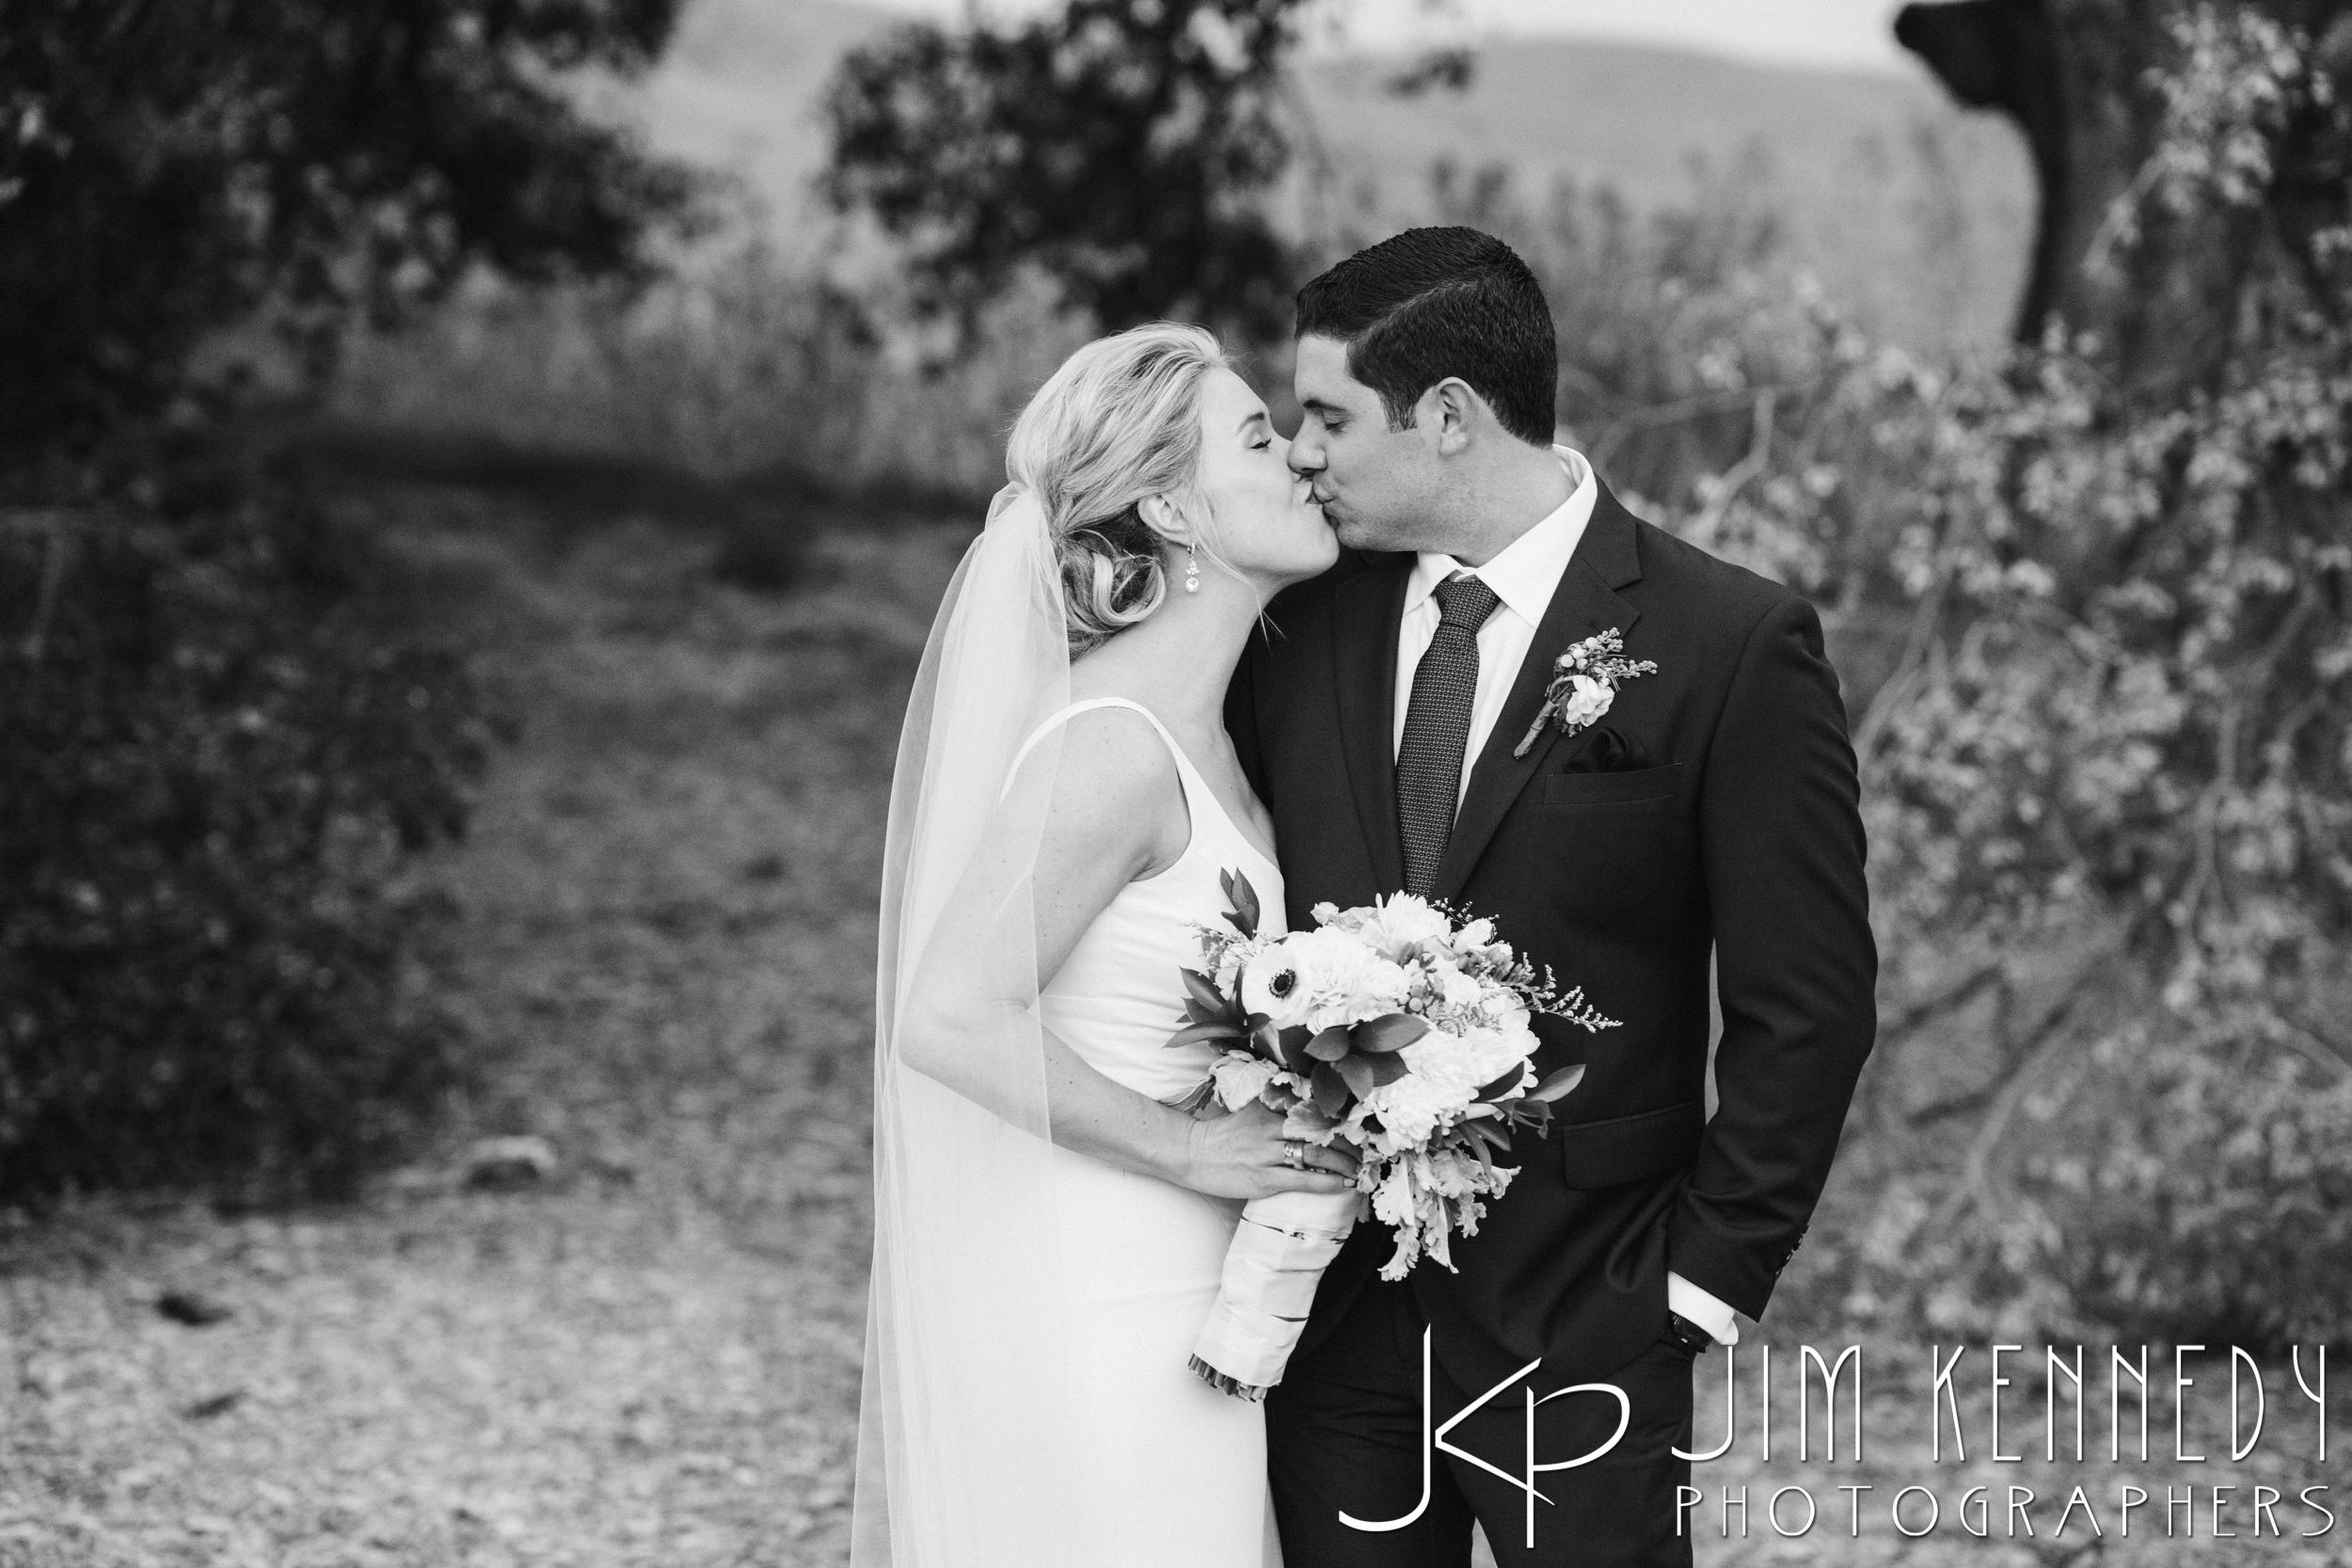 jim_kennedy_photographers_highland_springs_wedding_caitlyn_0153.jpg